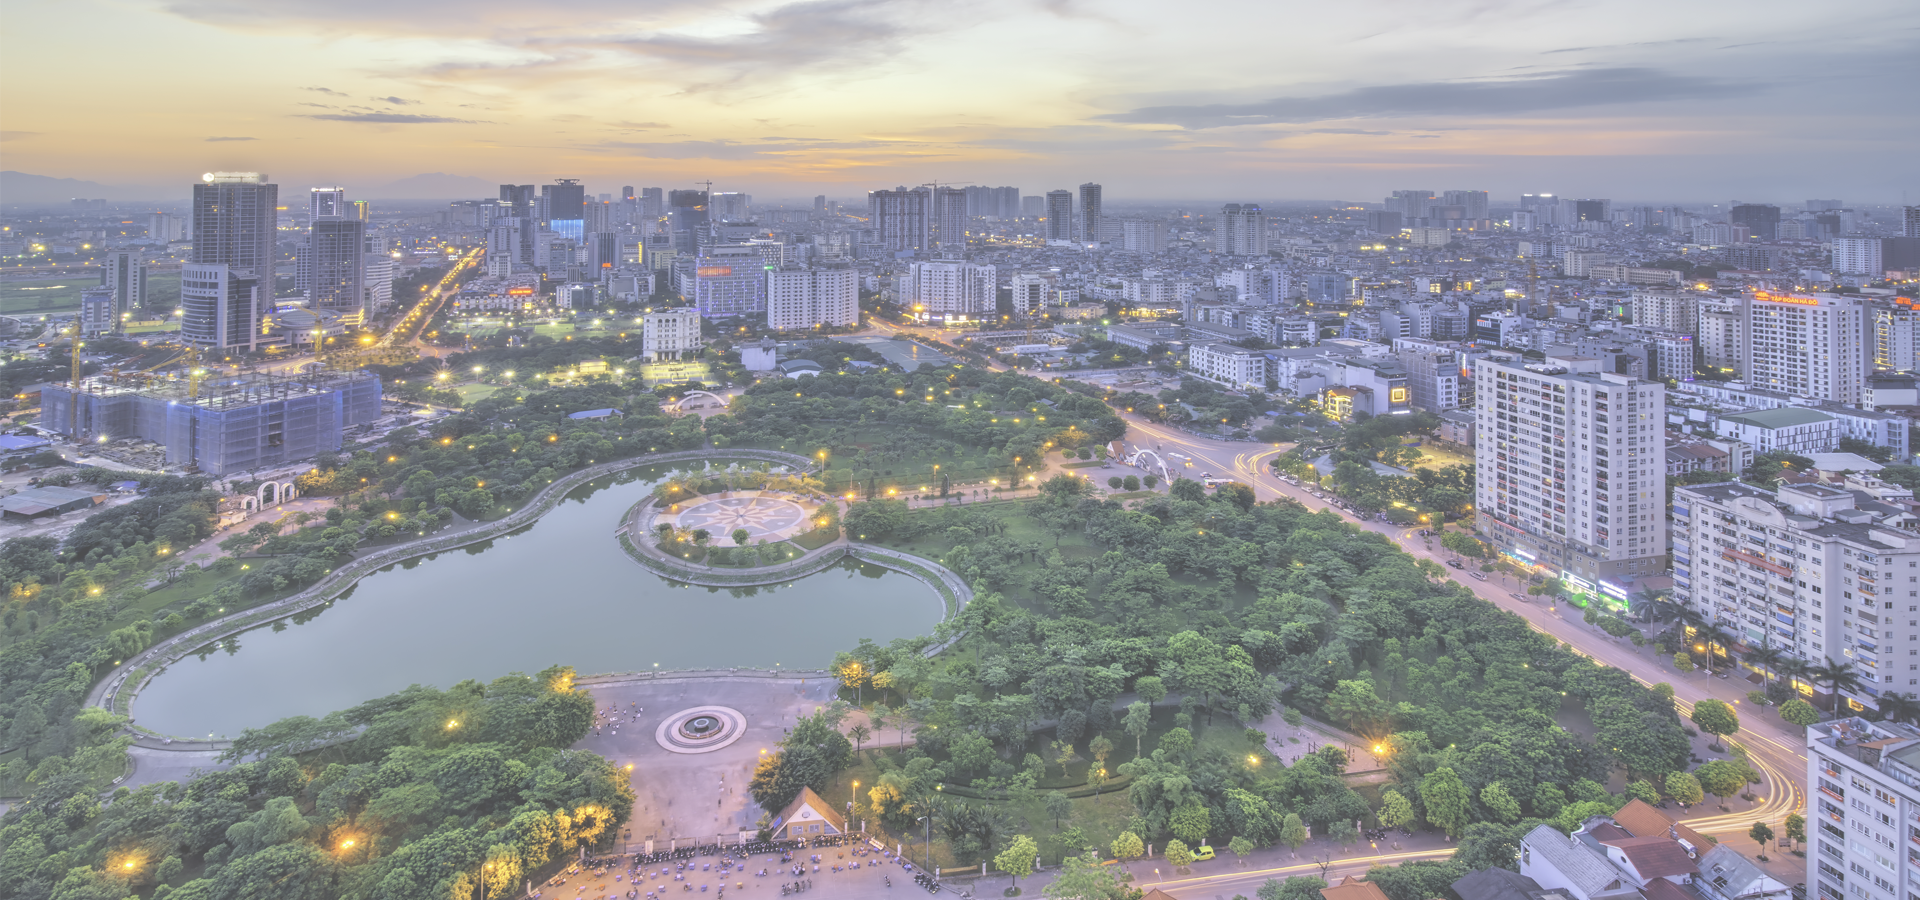 Peer-to-peer advisory in Hanoi, Hà Nội City, Red River Delta, Vietnam